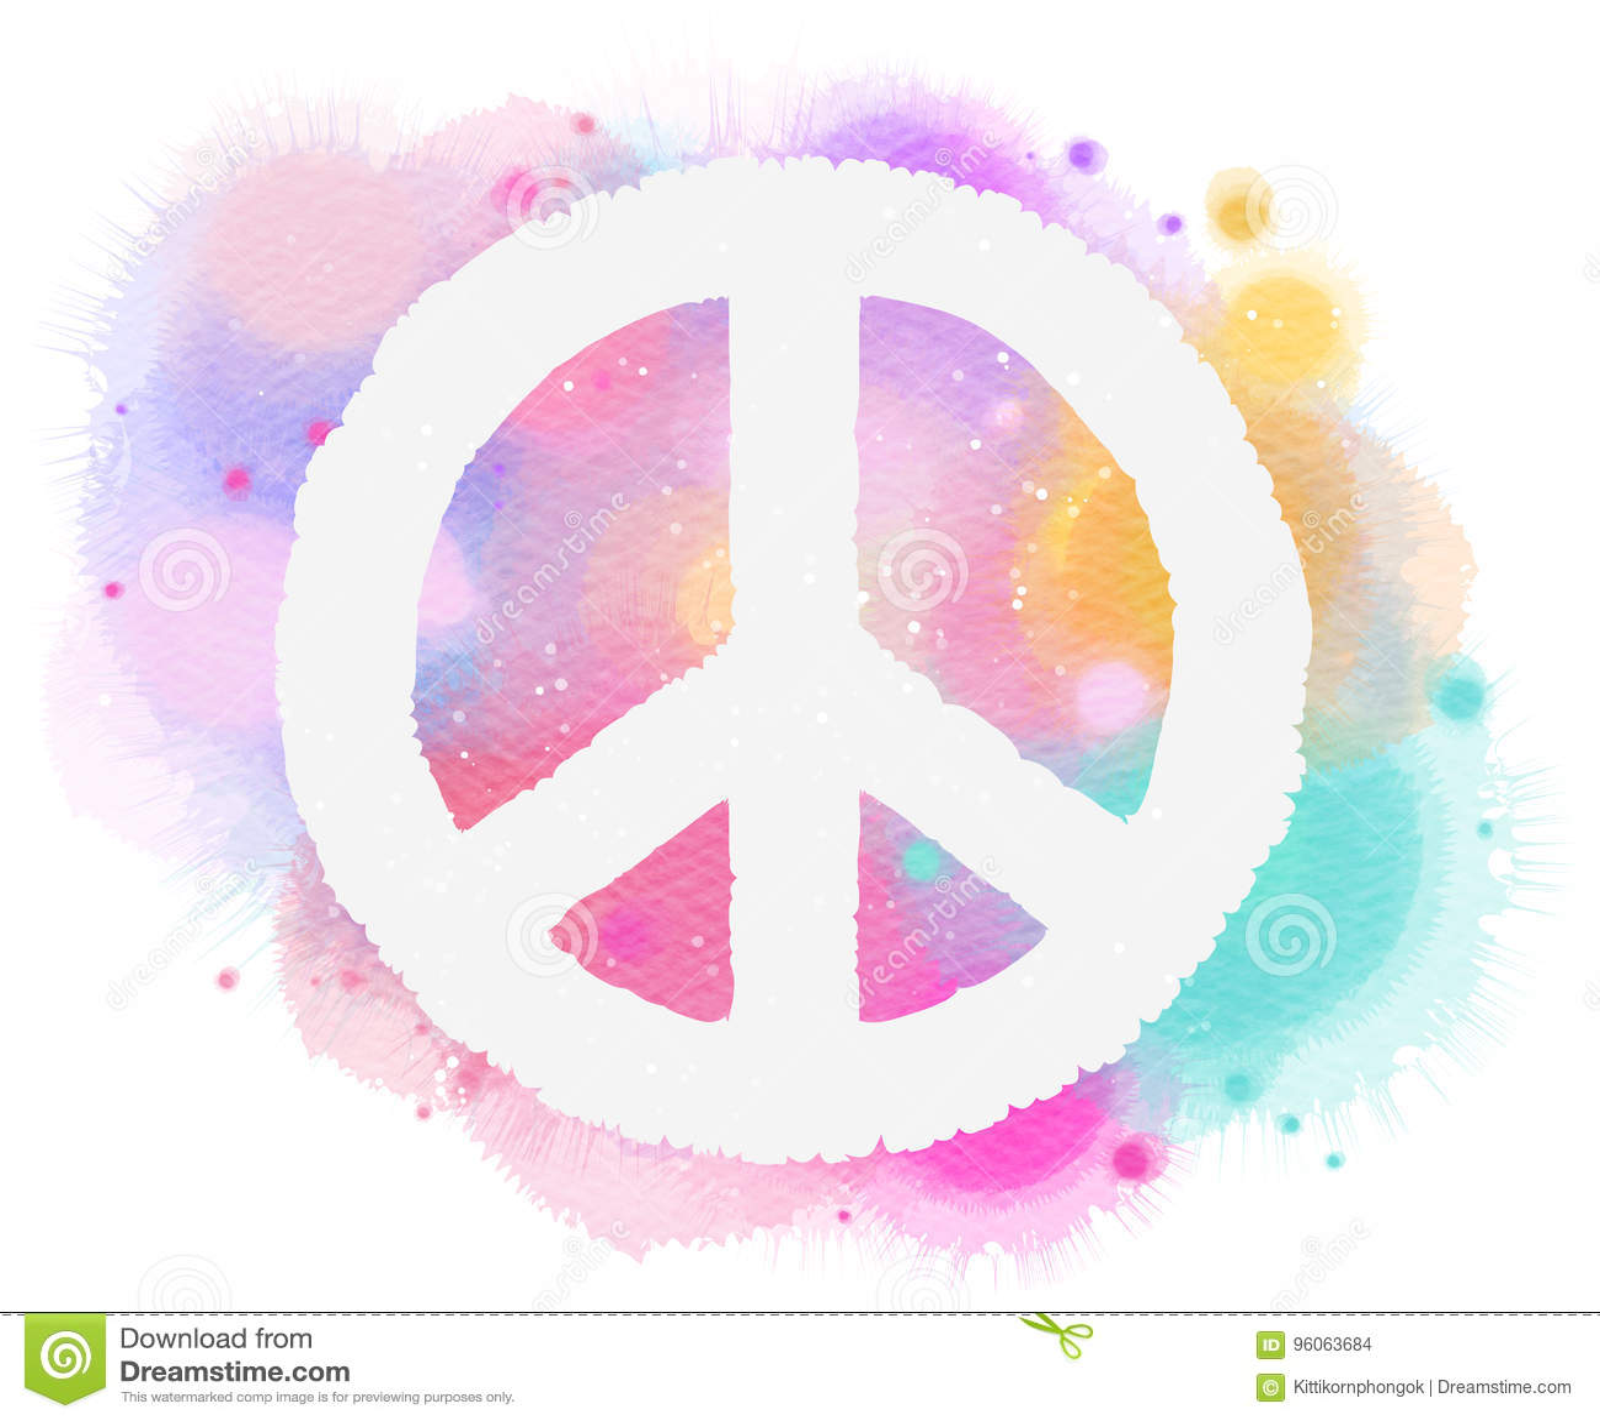 Watercolor Peace Symbol Digital Art Painting Stock Illustration